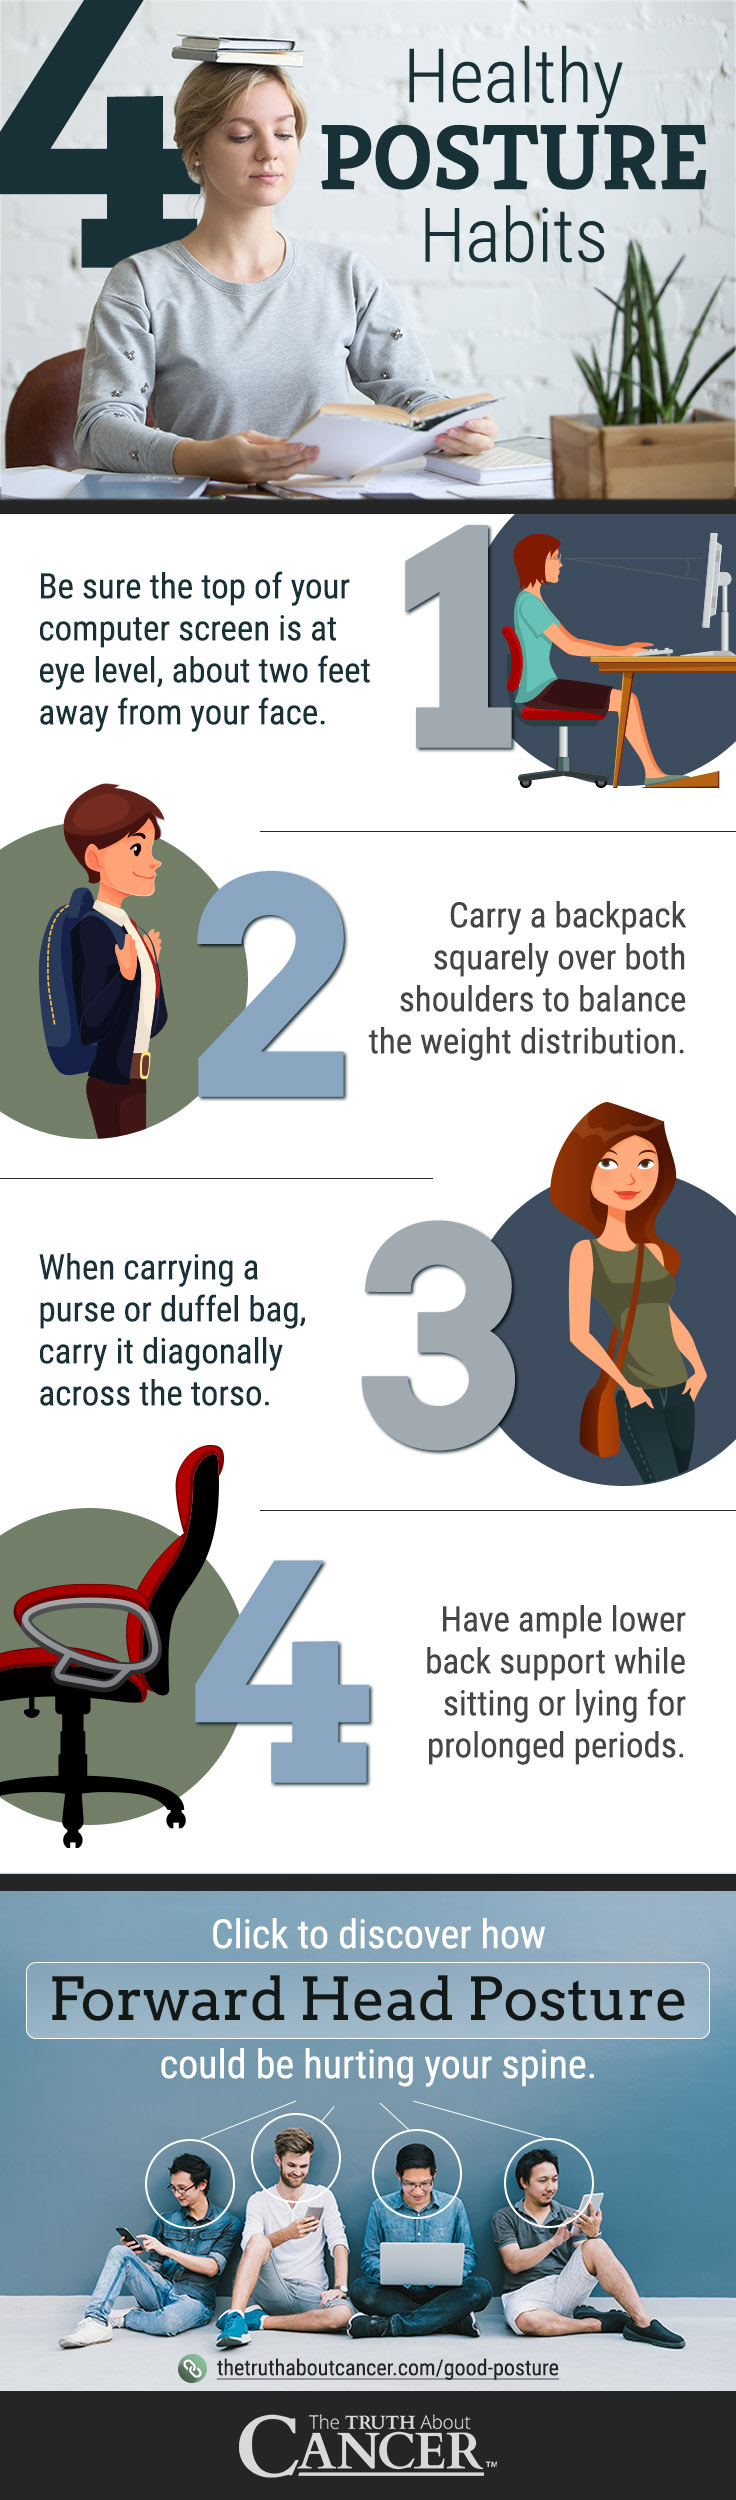 4 Healthy Posture Habits